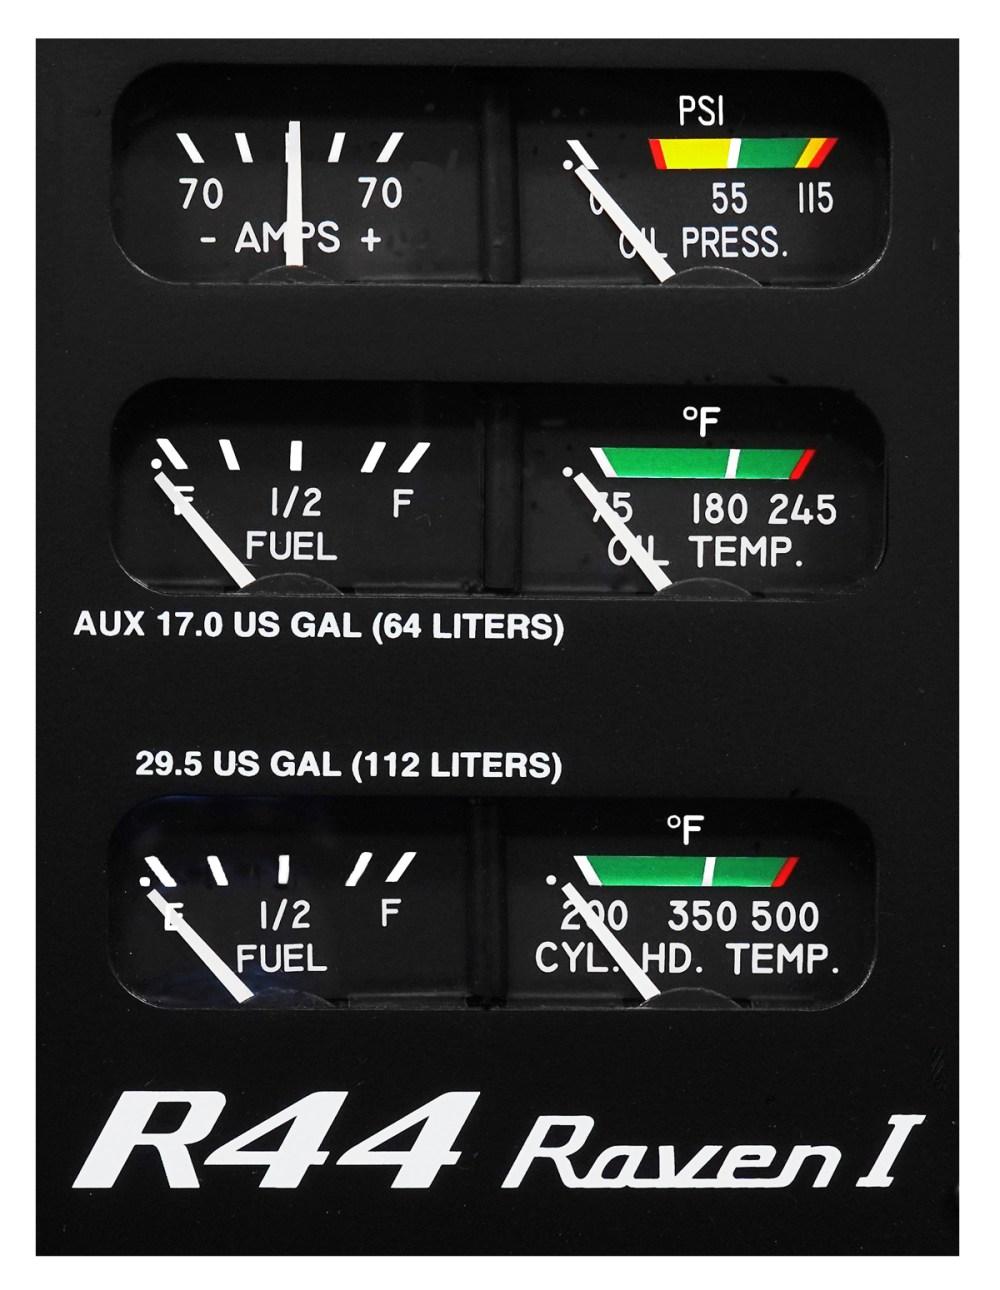 medium resolution of r44 raven i gage panel